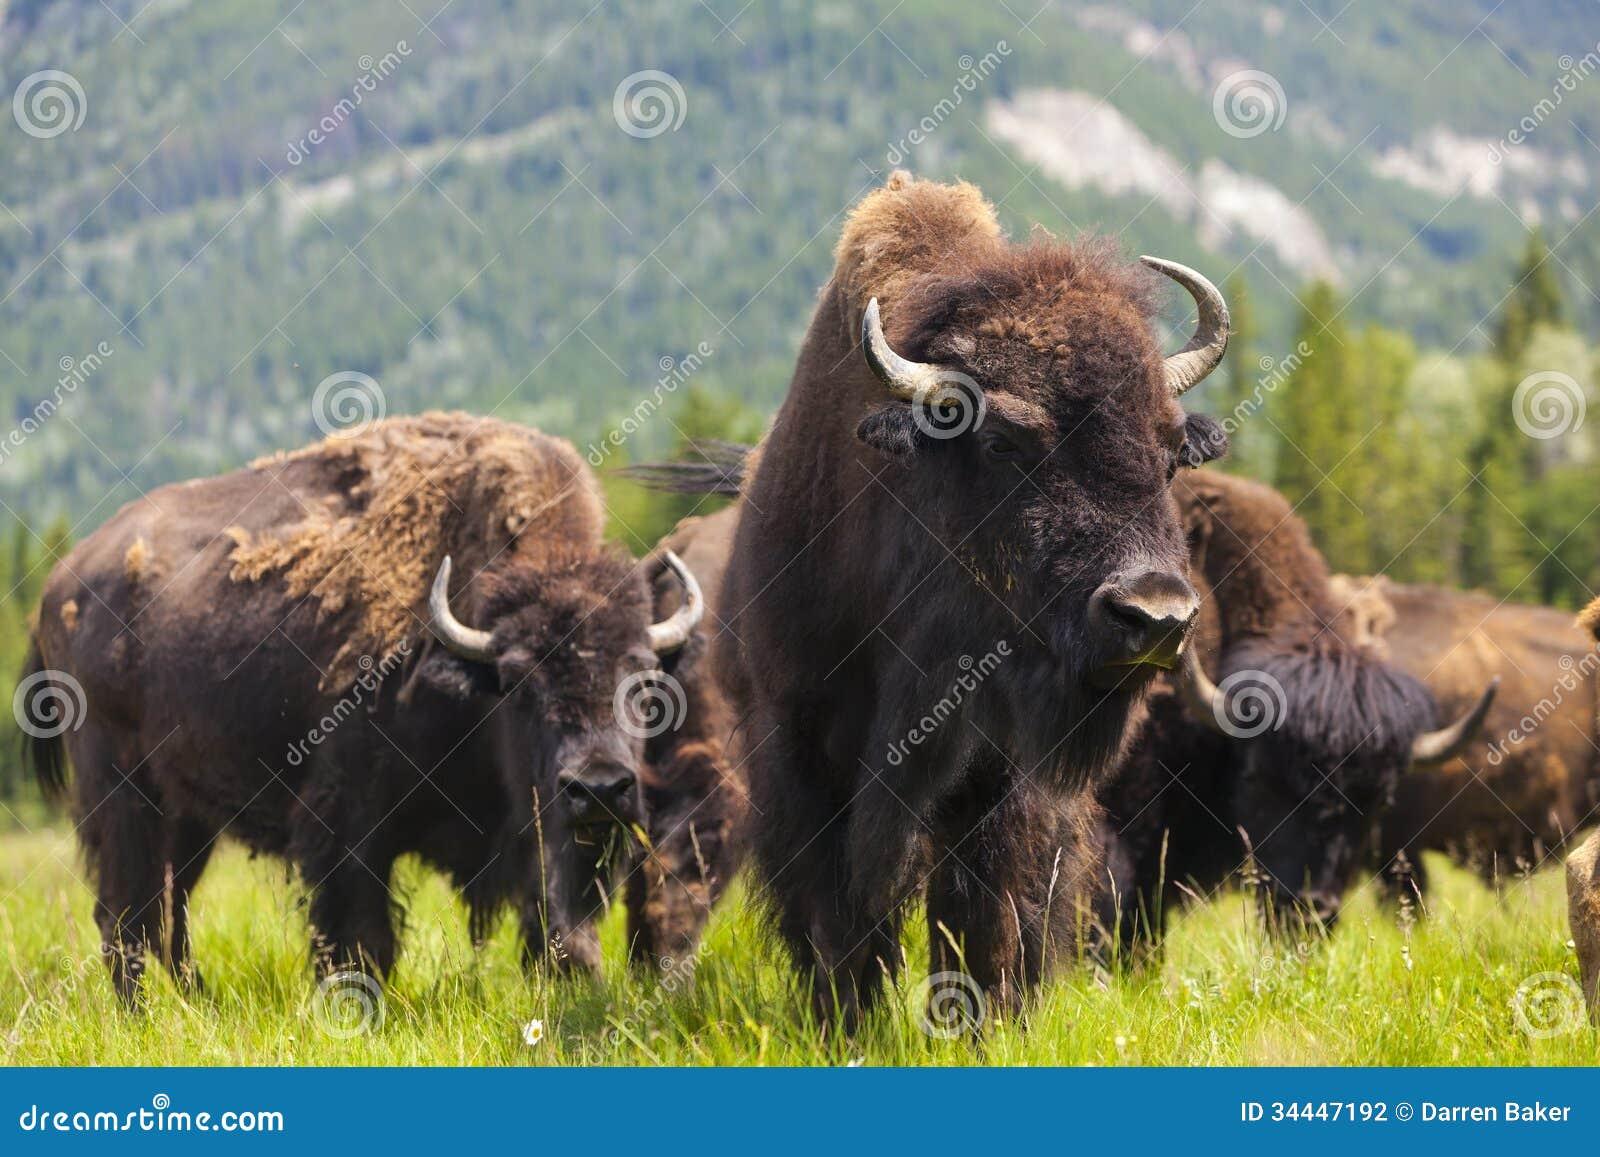 Bisonte americano ou búfalo